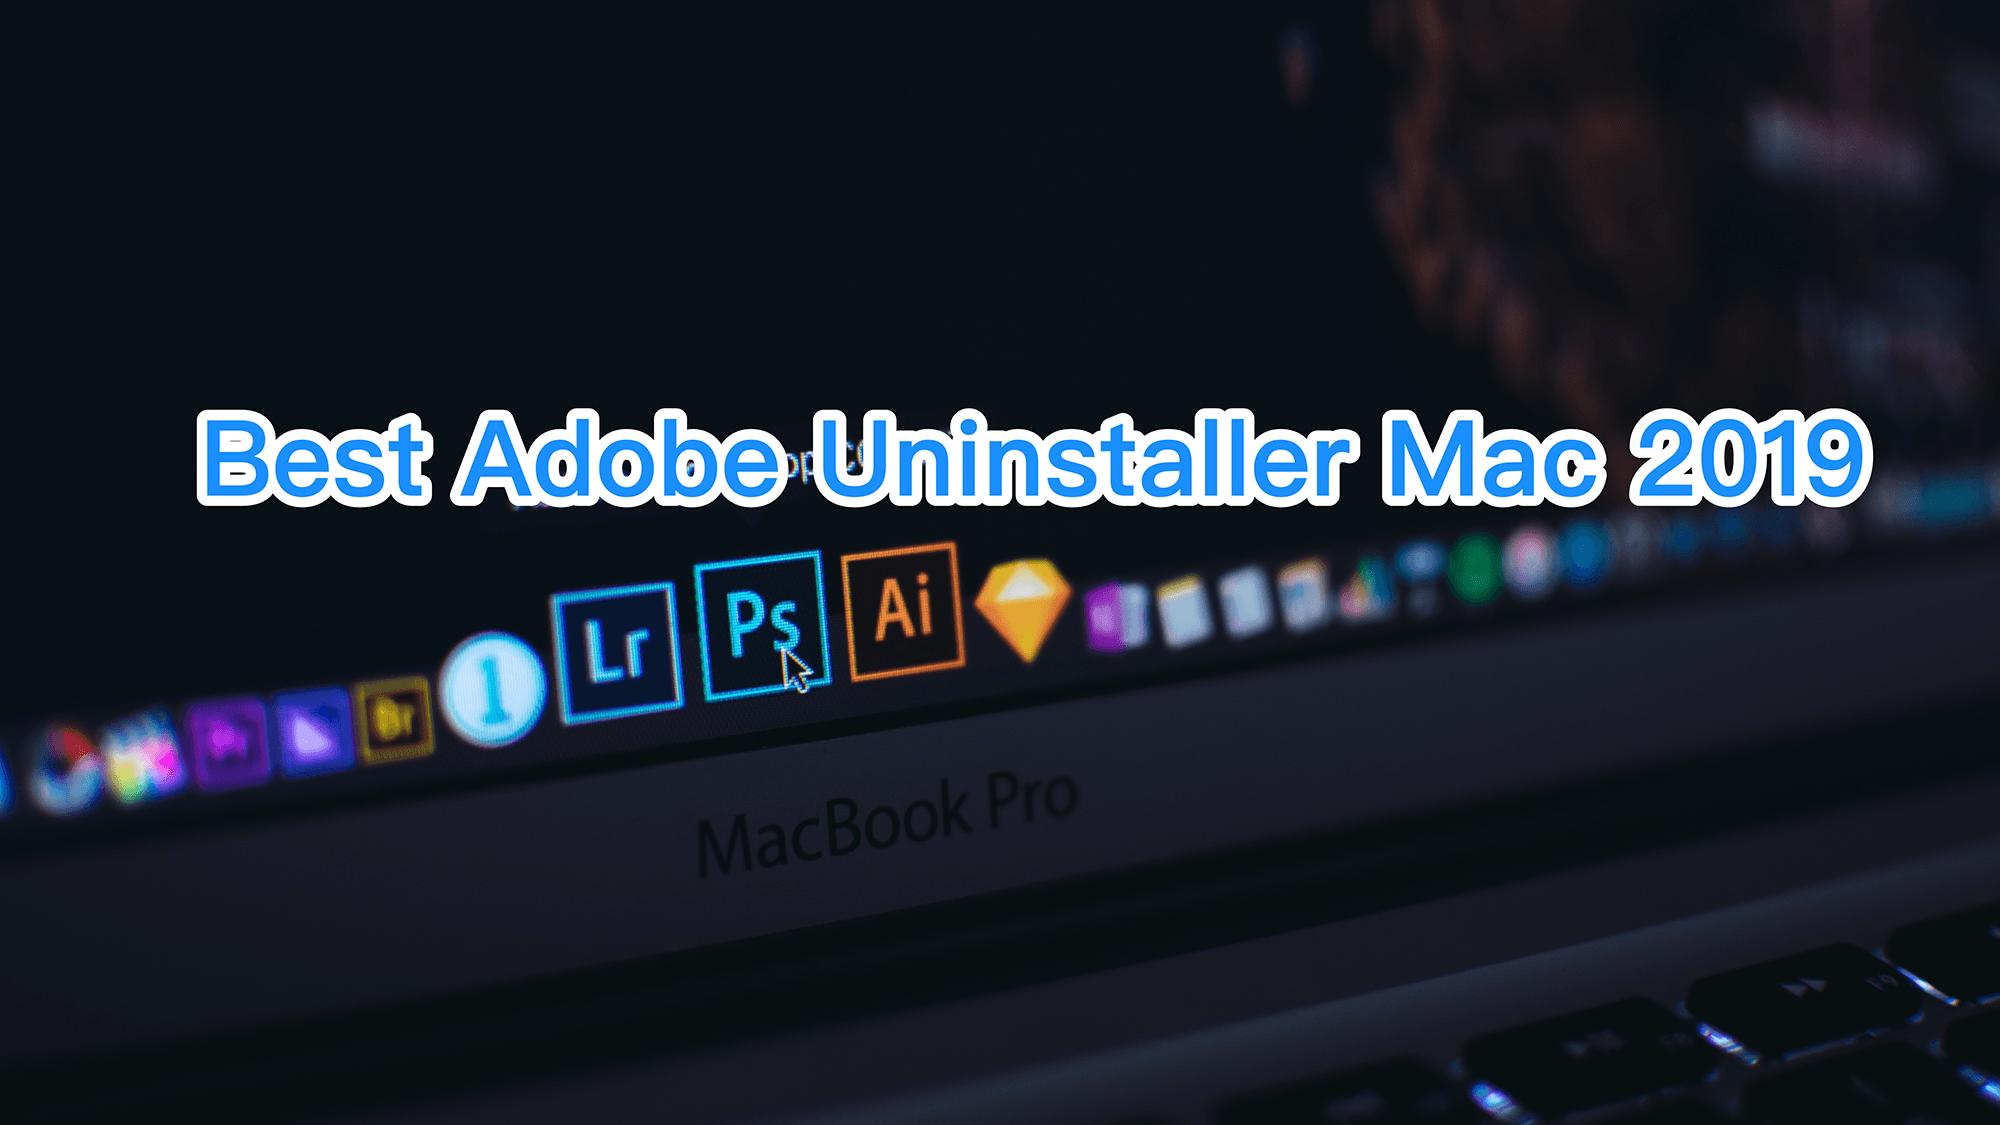 Get Top 5 best Adobe Uninstaller software for macOS